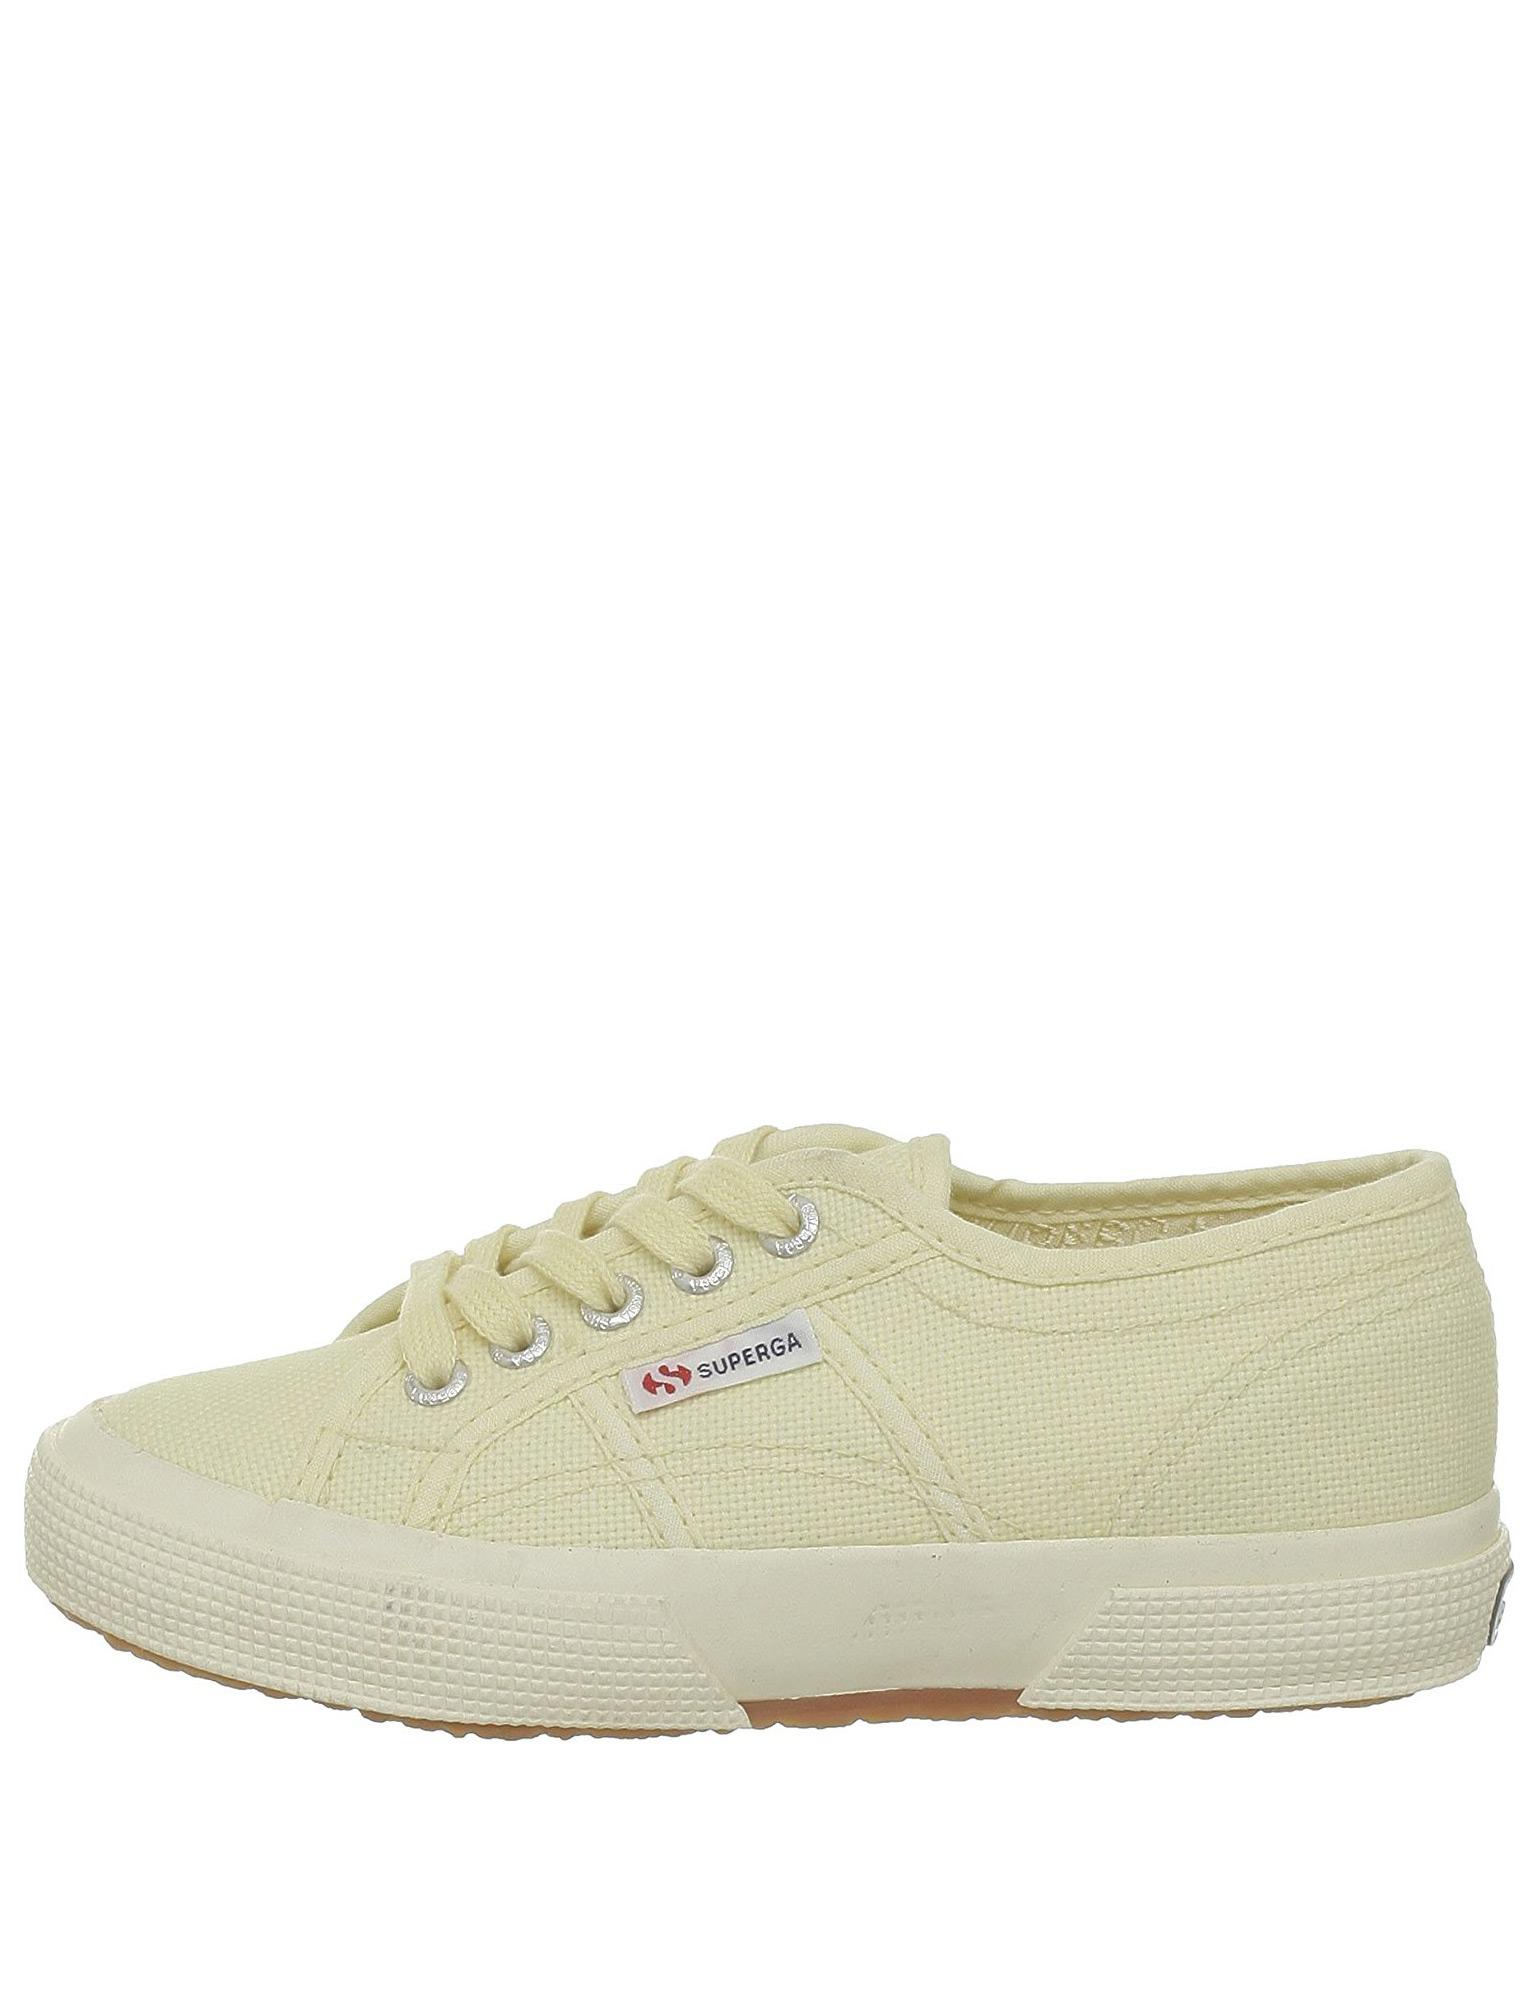 0fec355e87a8 Superga Kids 2750 Jcot Classic Sneakers Beige - Superga girls  low-top  sneakers by